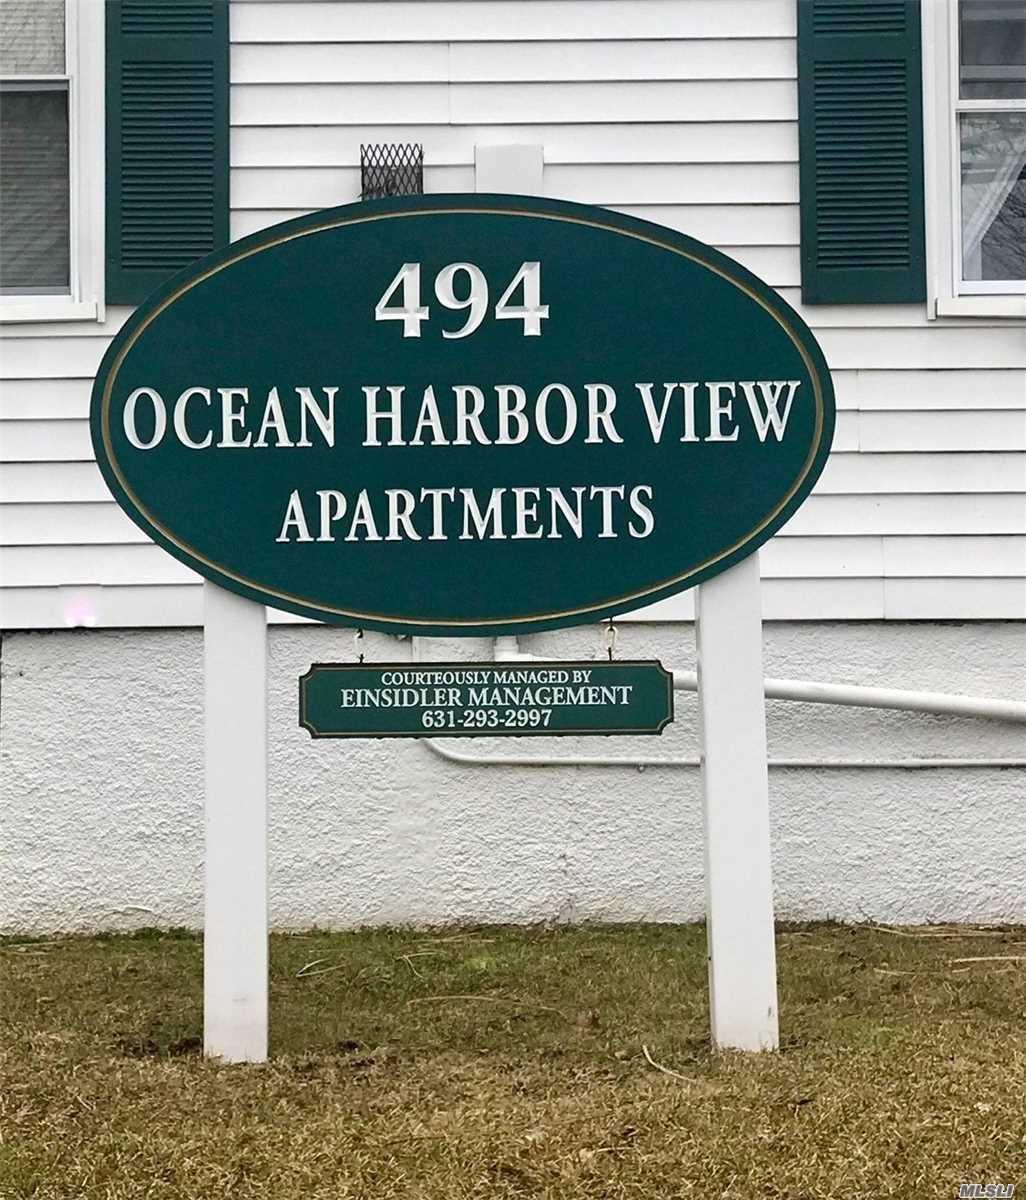 494 S Ocean Avenue, 4B - Freeport, New York